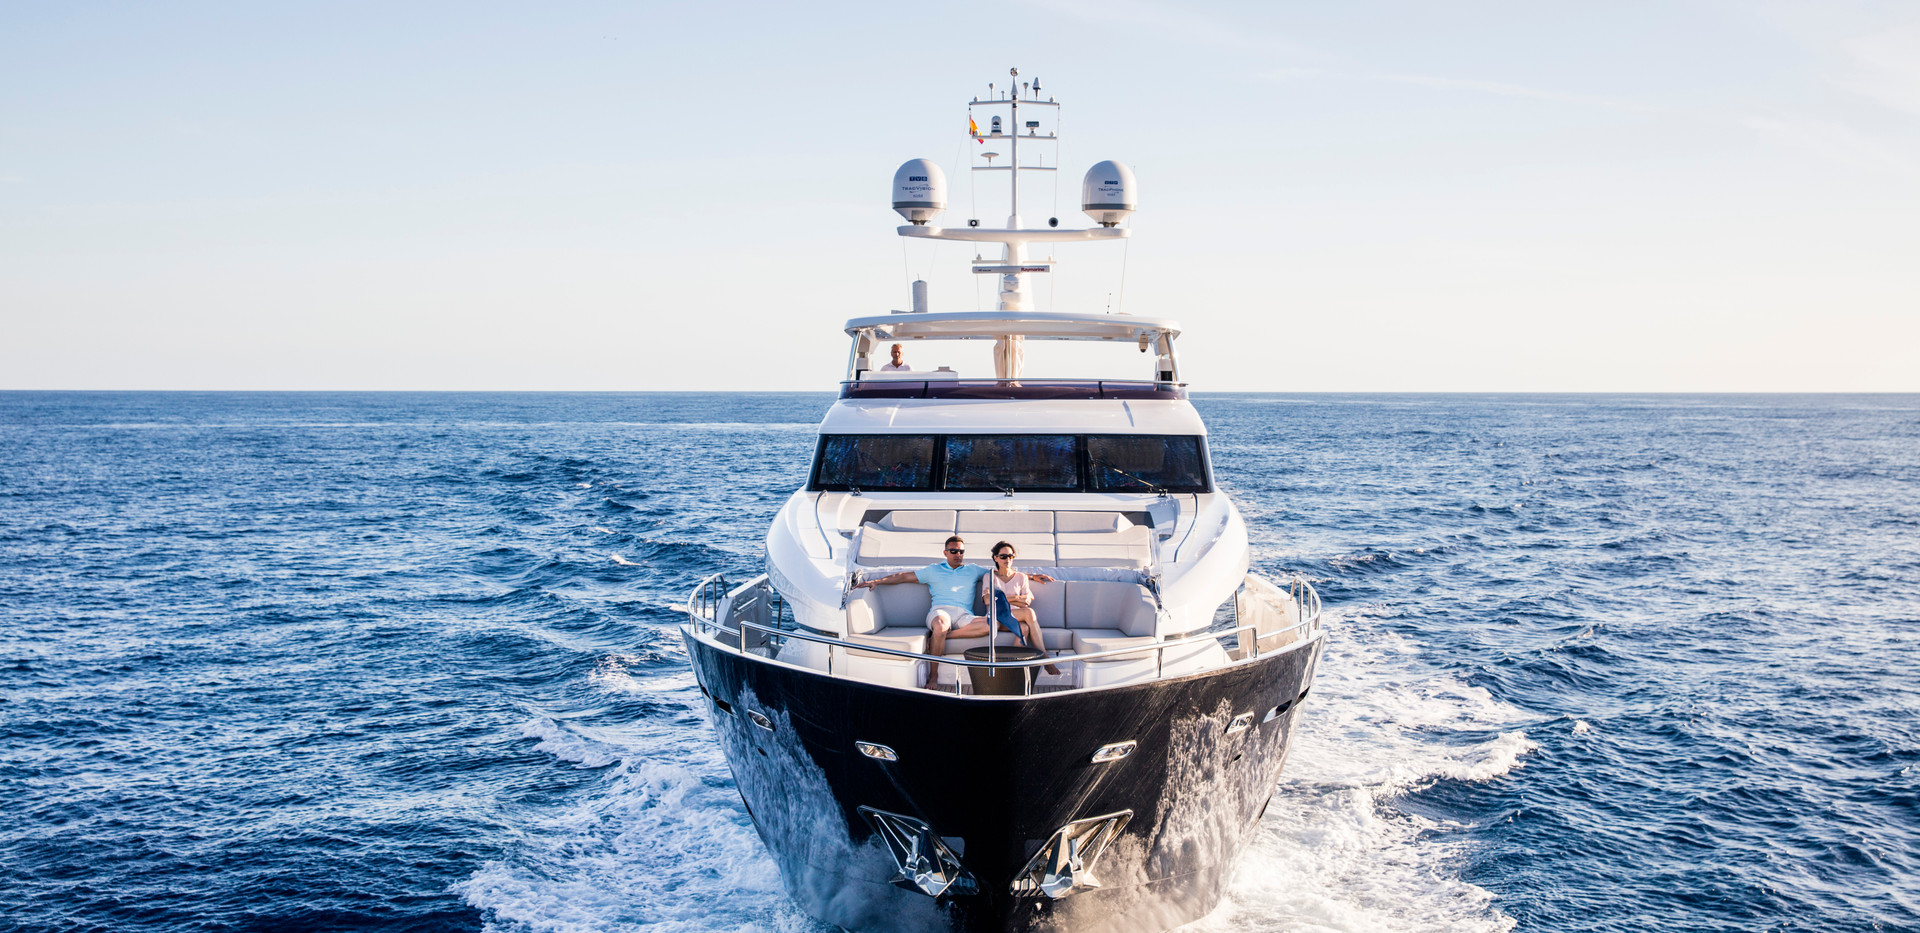 30m-exterior-blue-hull-15Yachrbrokers Pr